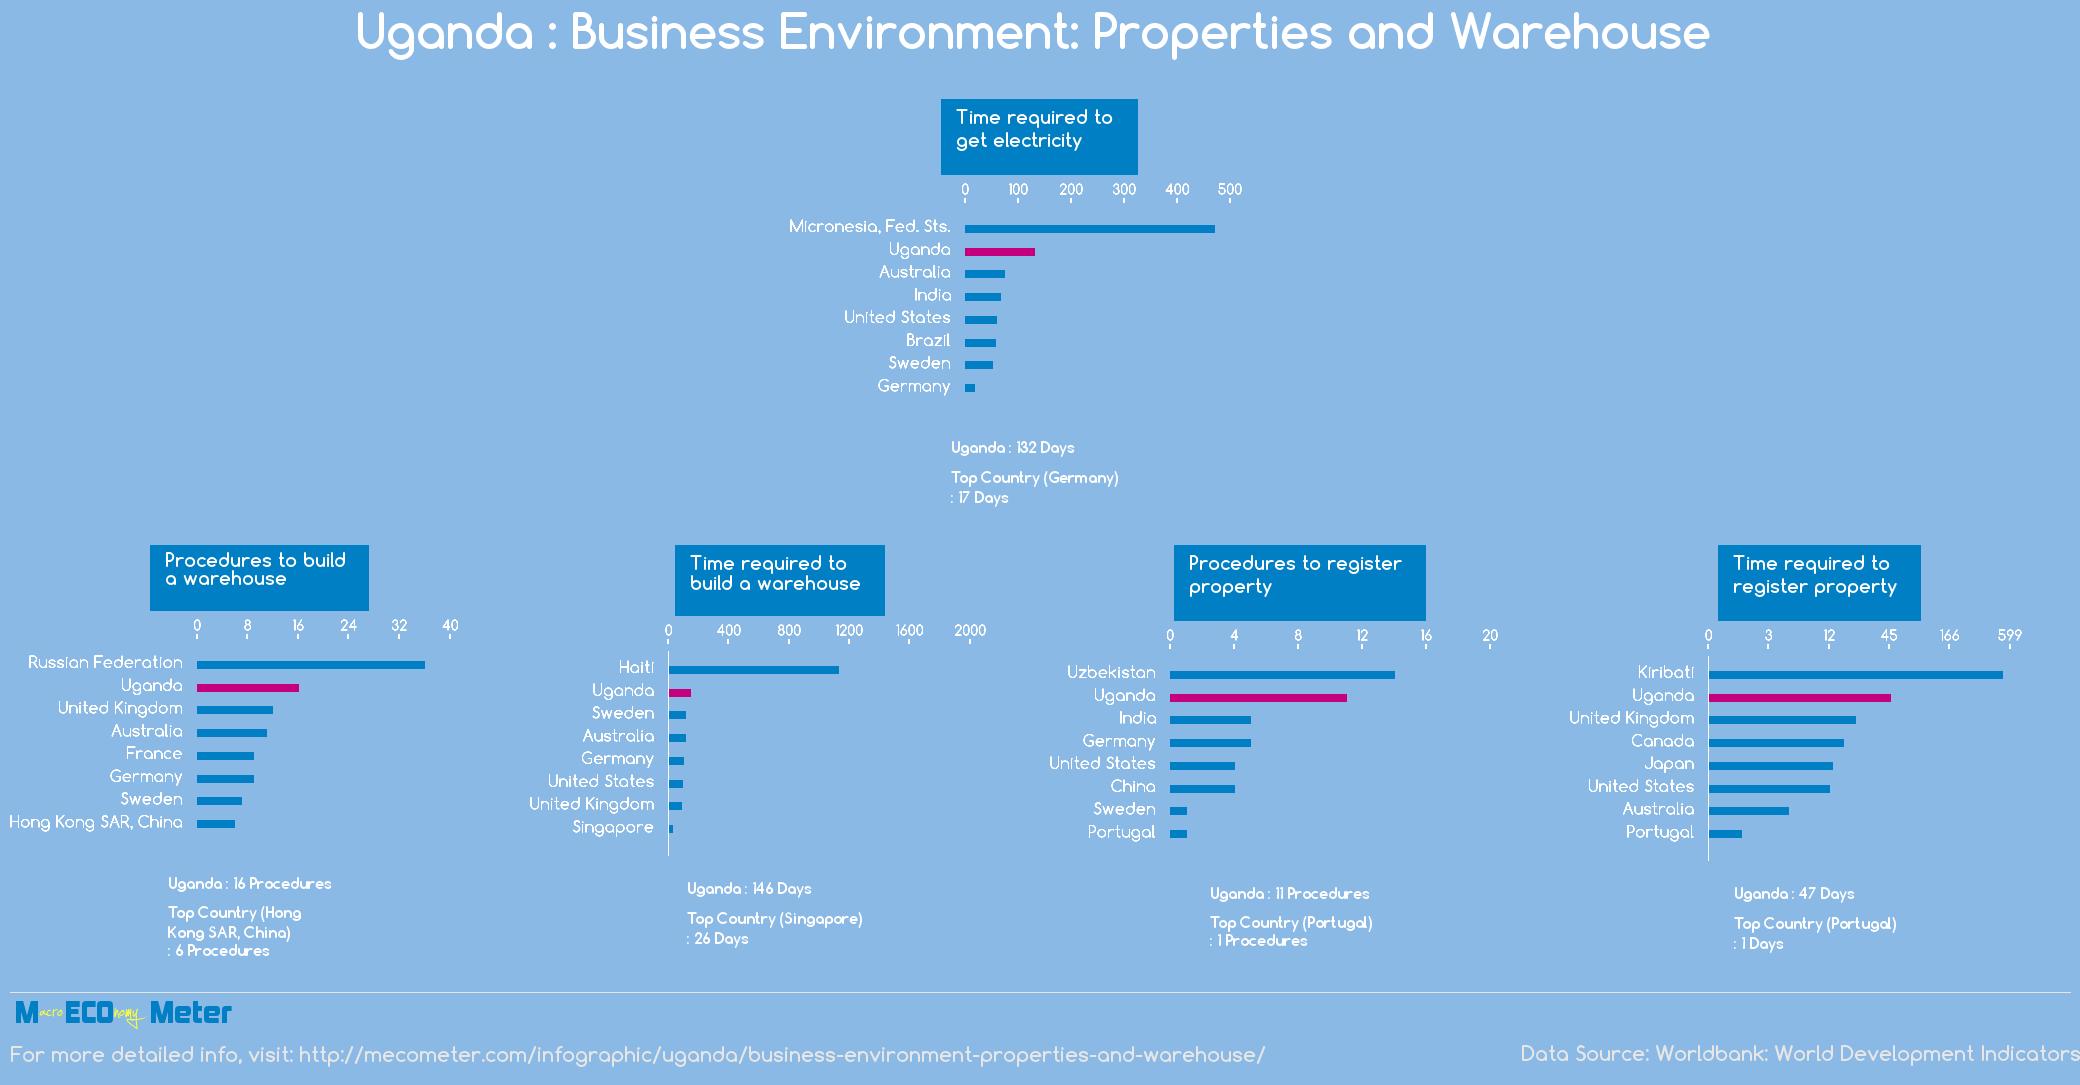 Uganda : Business Environment: Properties and Warehouse